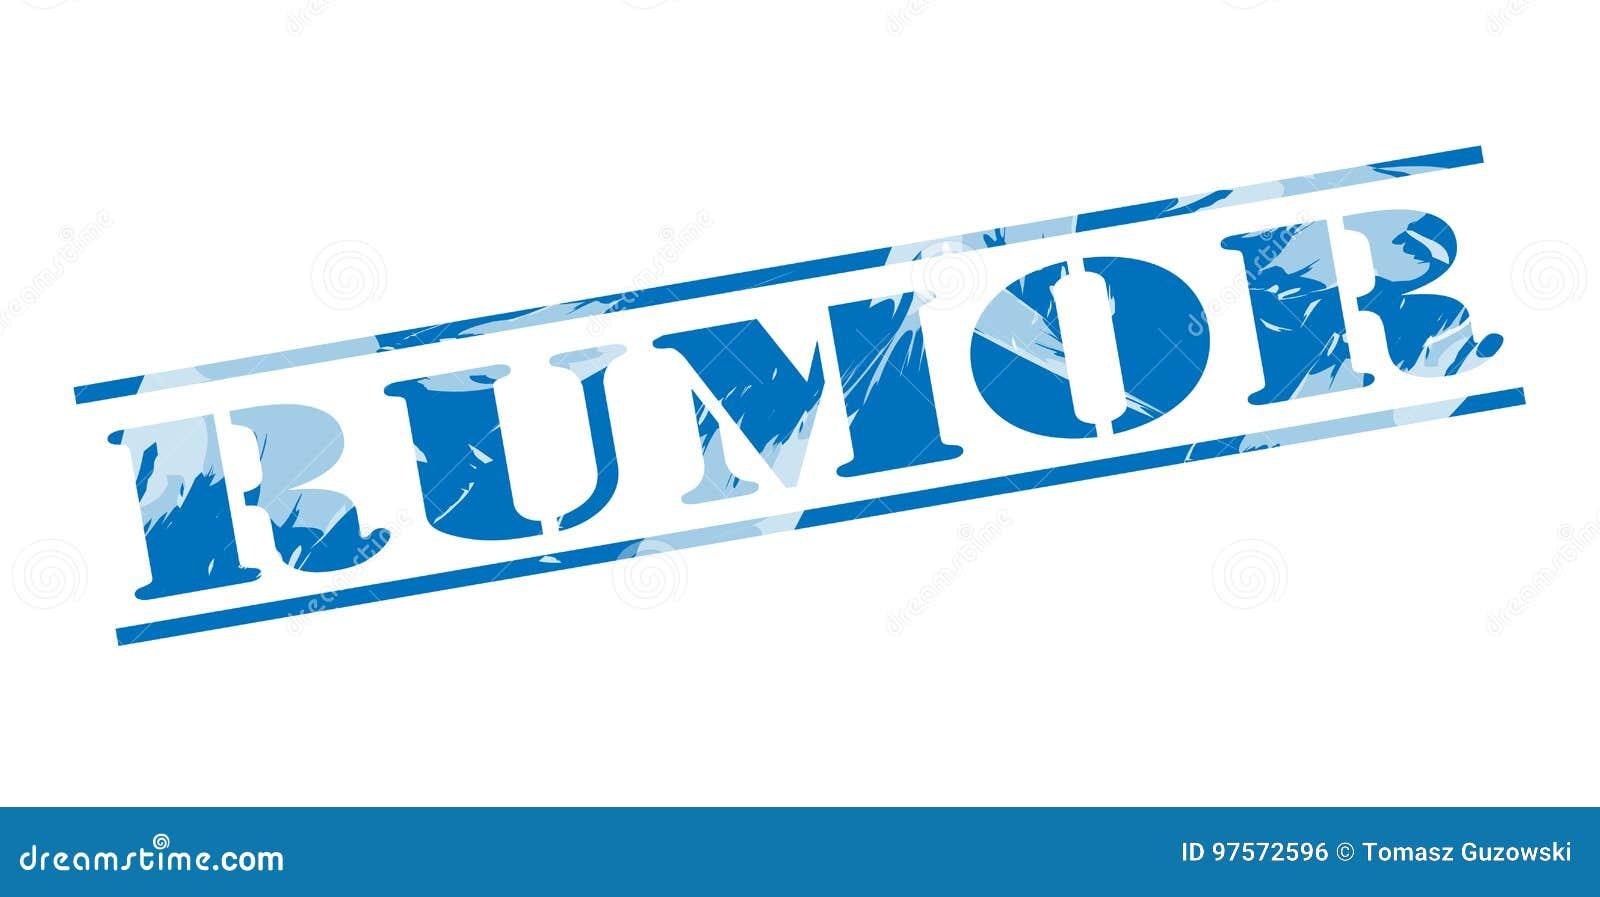 Rumor Cartoons, Illustrations & Vector Stock Images